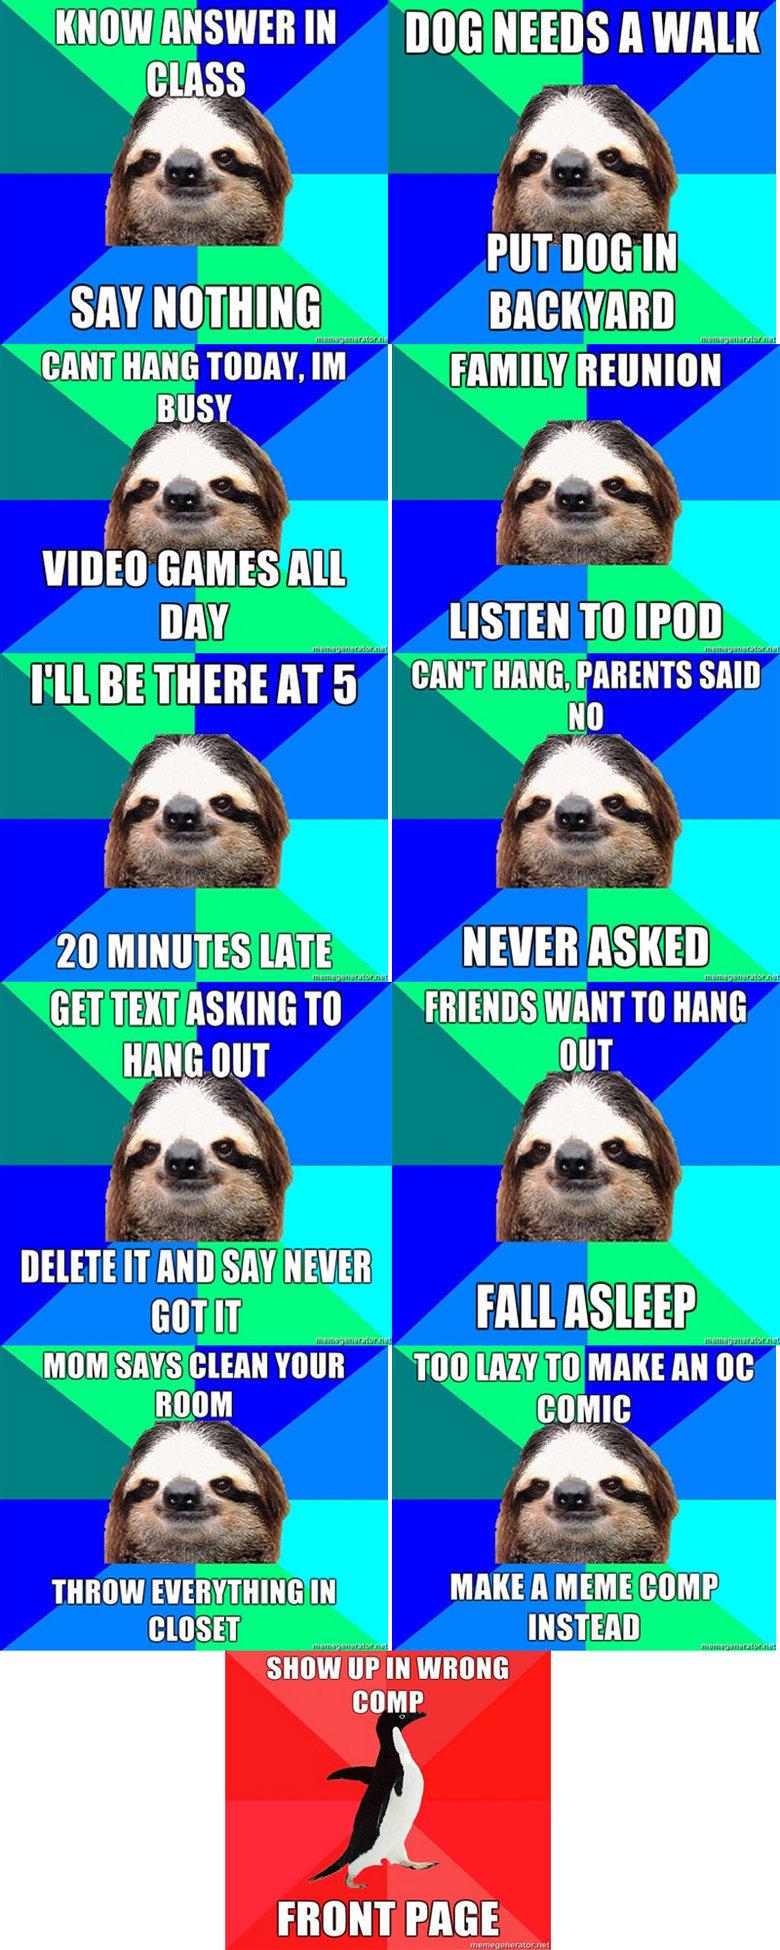 "Awkward Sloth comp. . WW ANSWER lillie Mtl NEWS A WAN cant manta TODAY. iii"" mam maisie""""""""""""'' miimii' ' All In BE mm; aij"" iii''"""" nuns. PARENTS GET TENT ASKI"